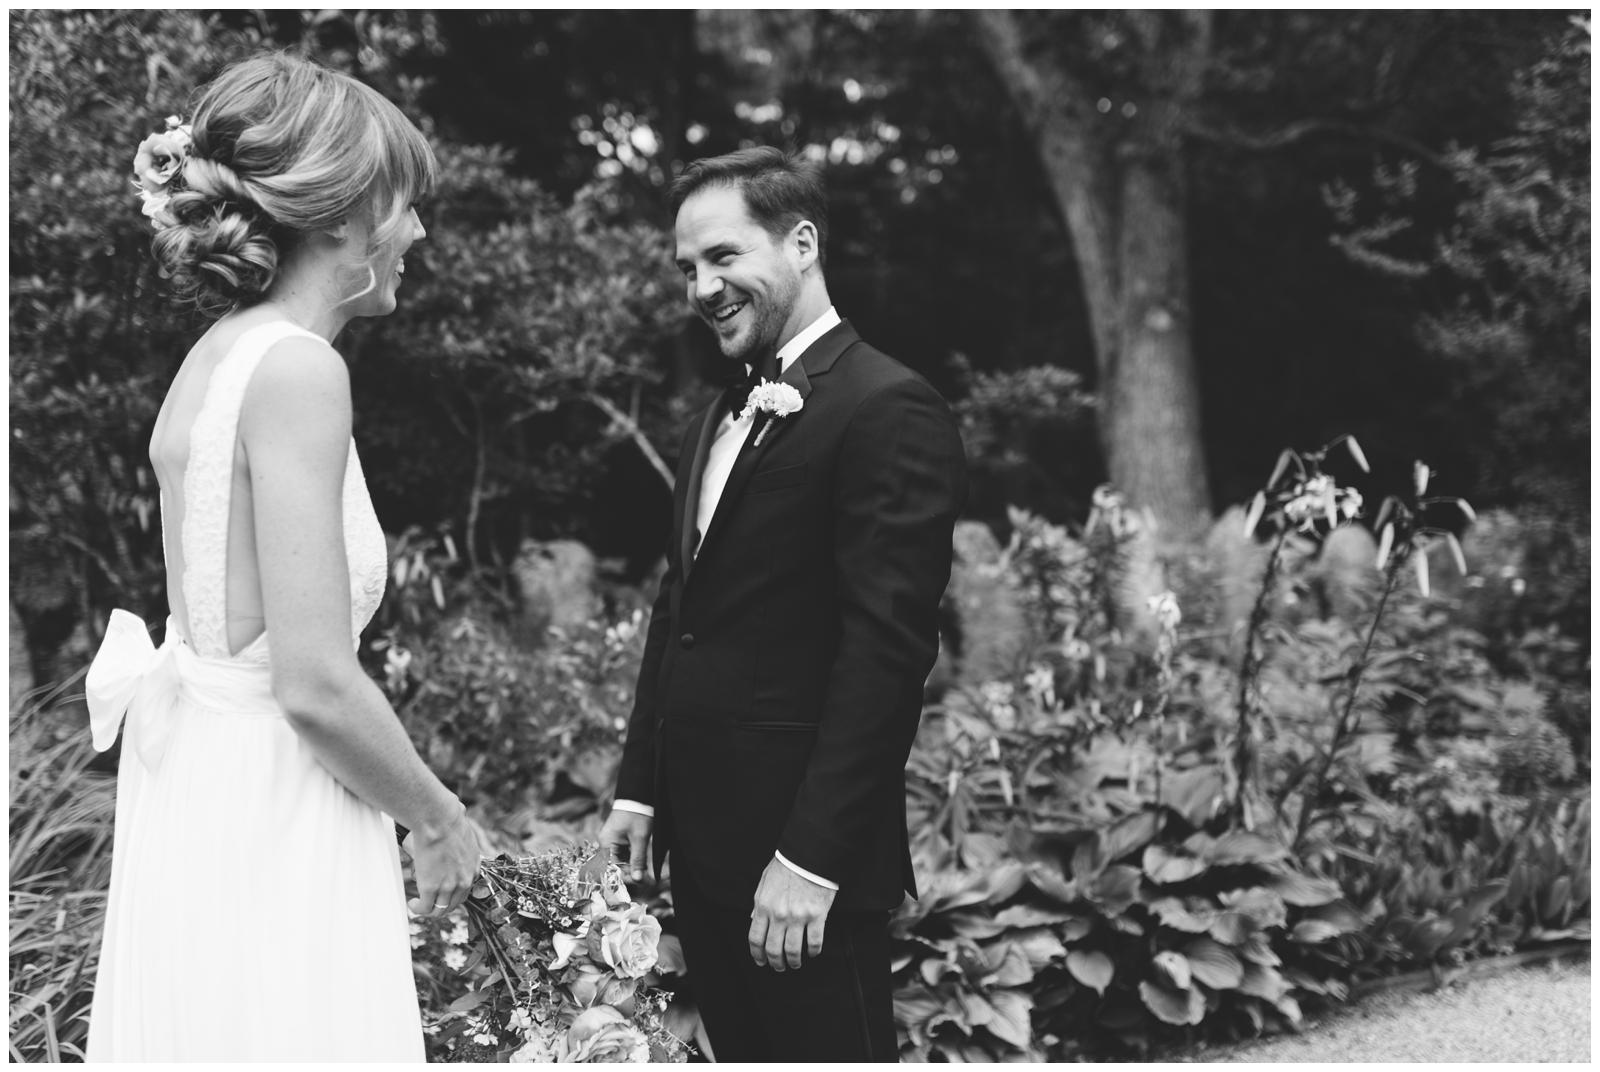 Moraine-Farm-wedding-Bailey-Q-Photo-Massachusetts-wedding-photpgrapher-017.jpg